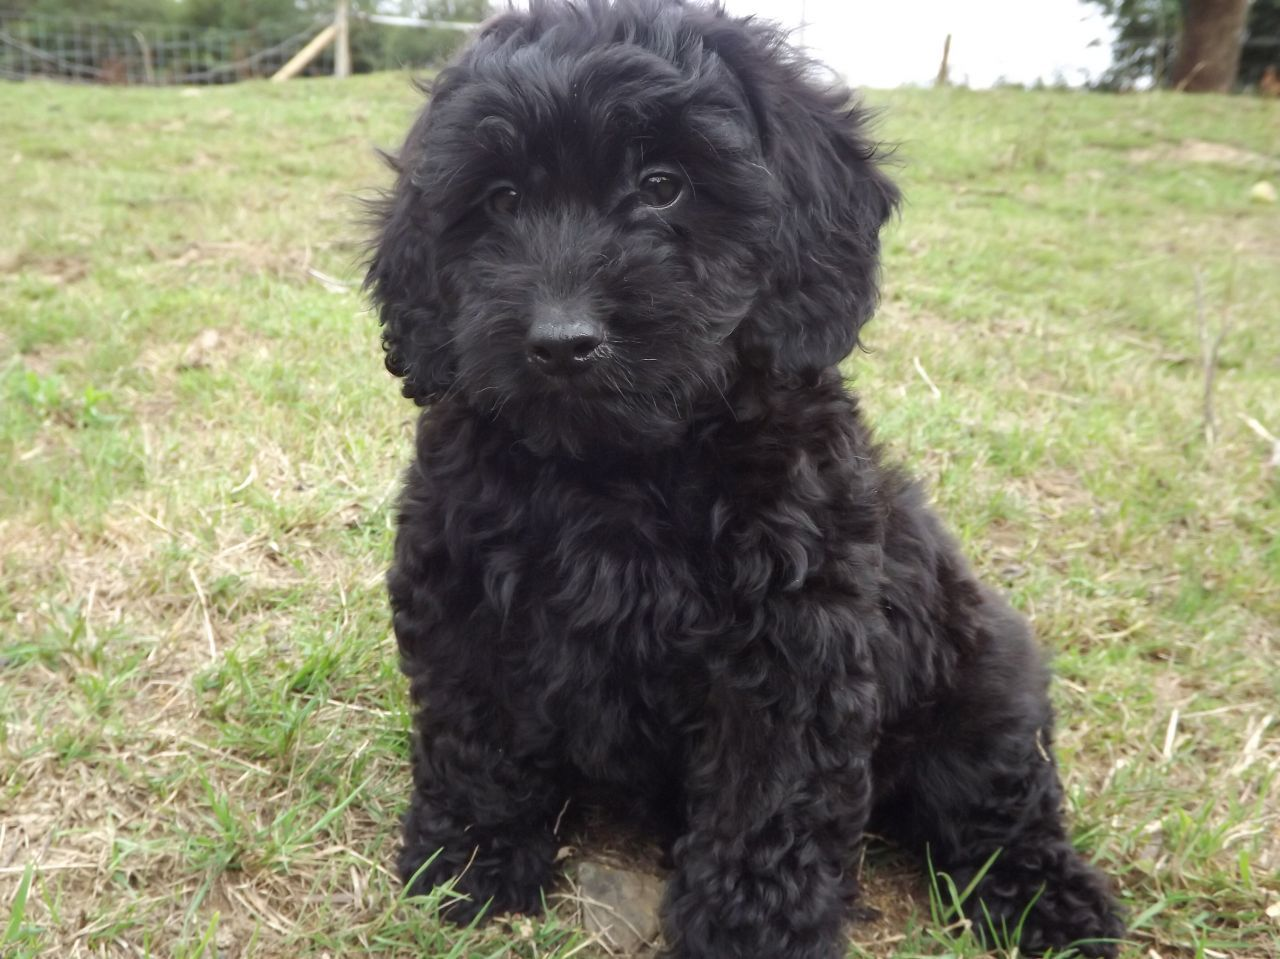 Gorgeaus Dark Cockapoo Puppies Cockapoo Puppies Puppies Black